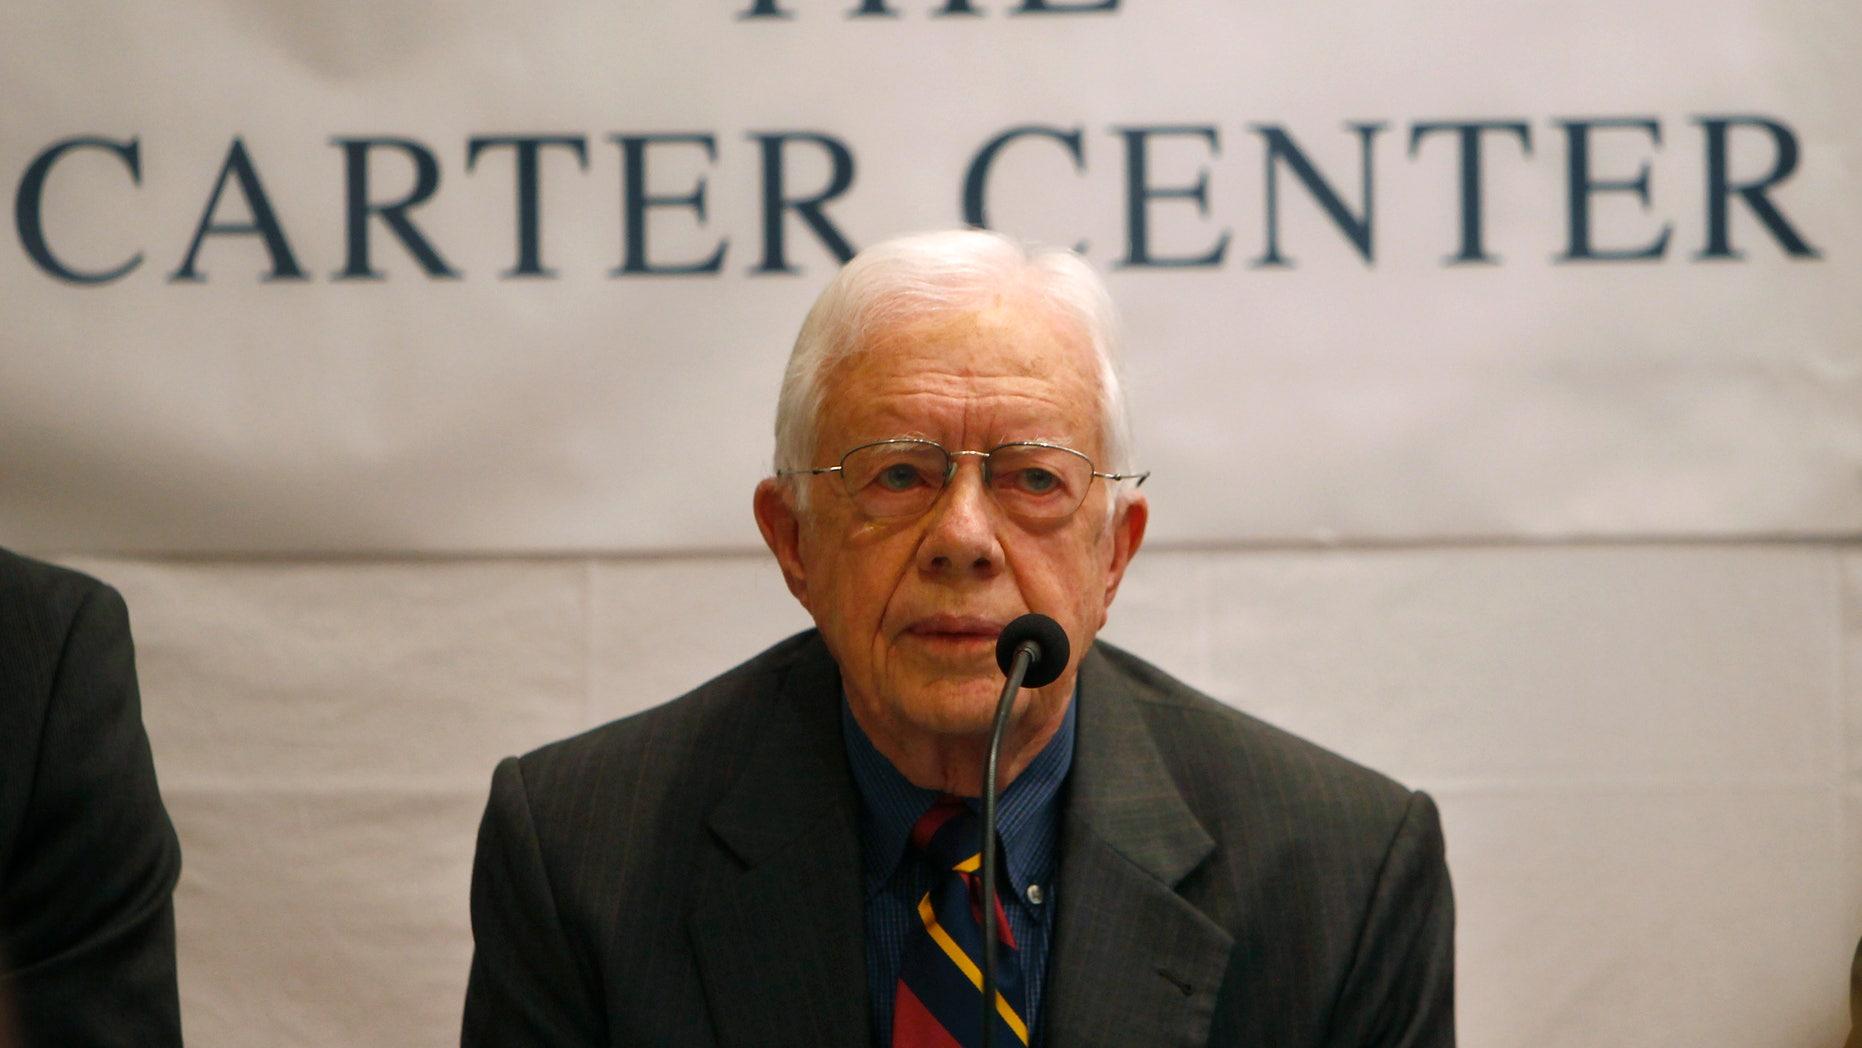 April 1, 2013 - Former U.S. President Jimmy Carter addresses a press conference in Katmandu.